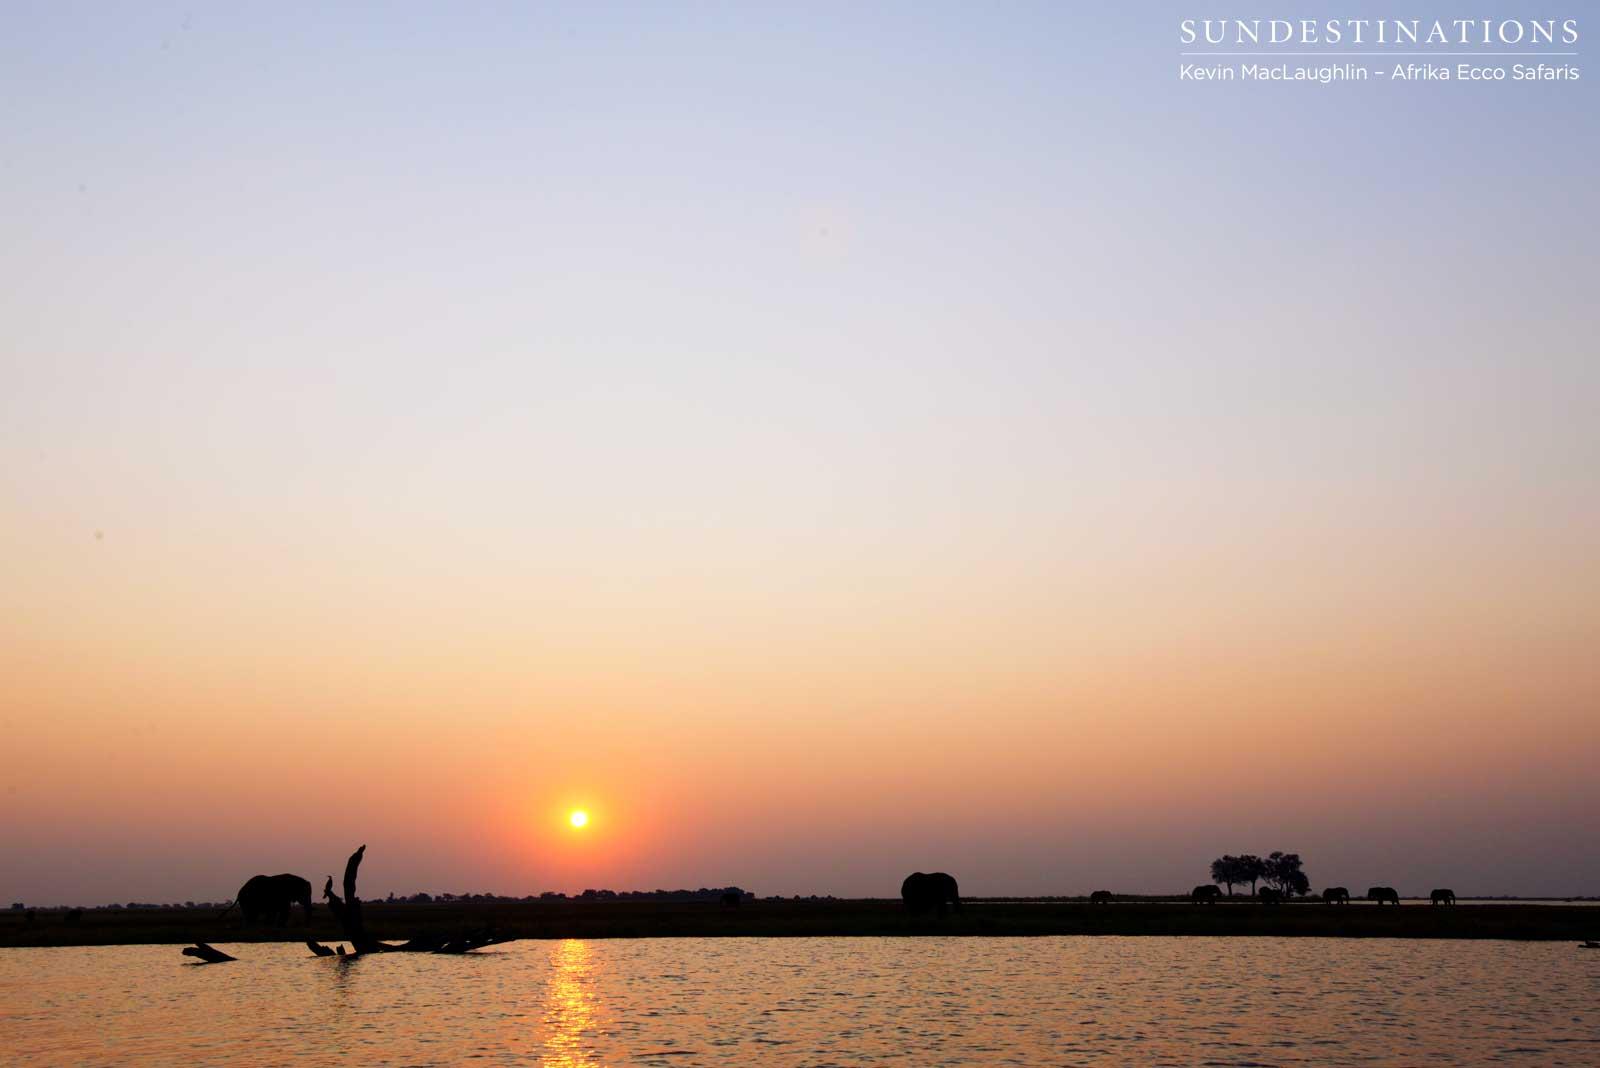 Chobe Riverfront Boat Cruise with Afrika Ecco Safaris